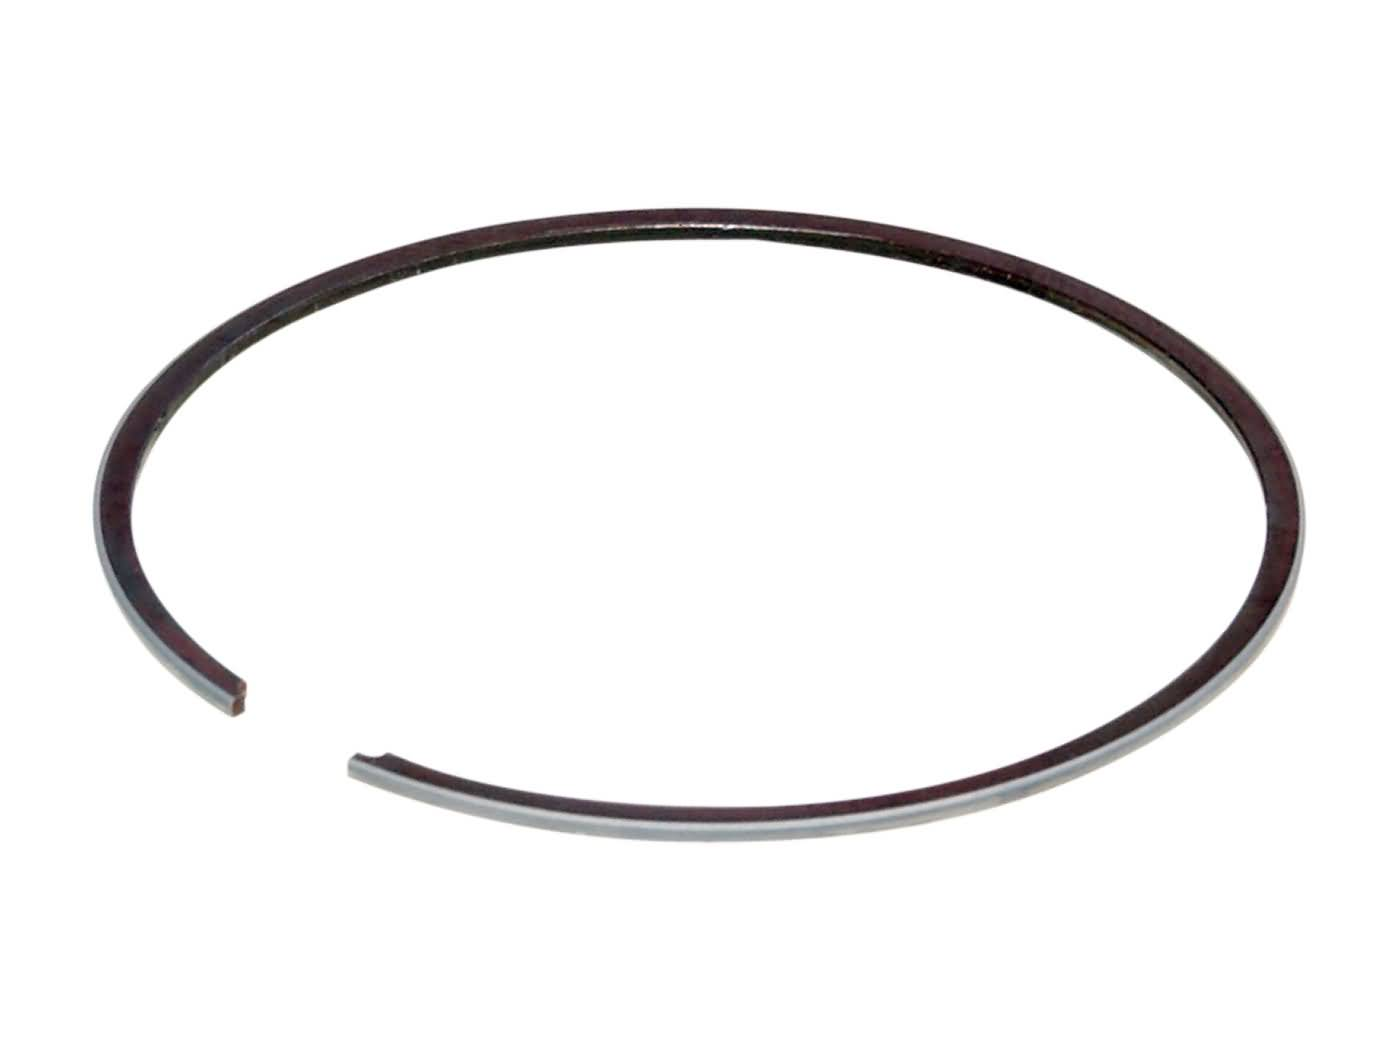 Kolbenring Polini 80ccm 50x1mm für Derbi D50B0, EBE, EBS